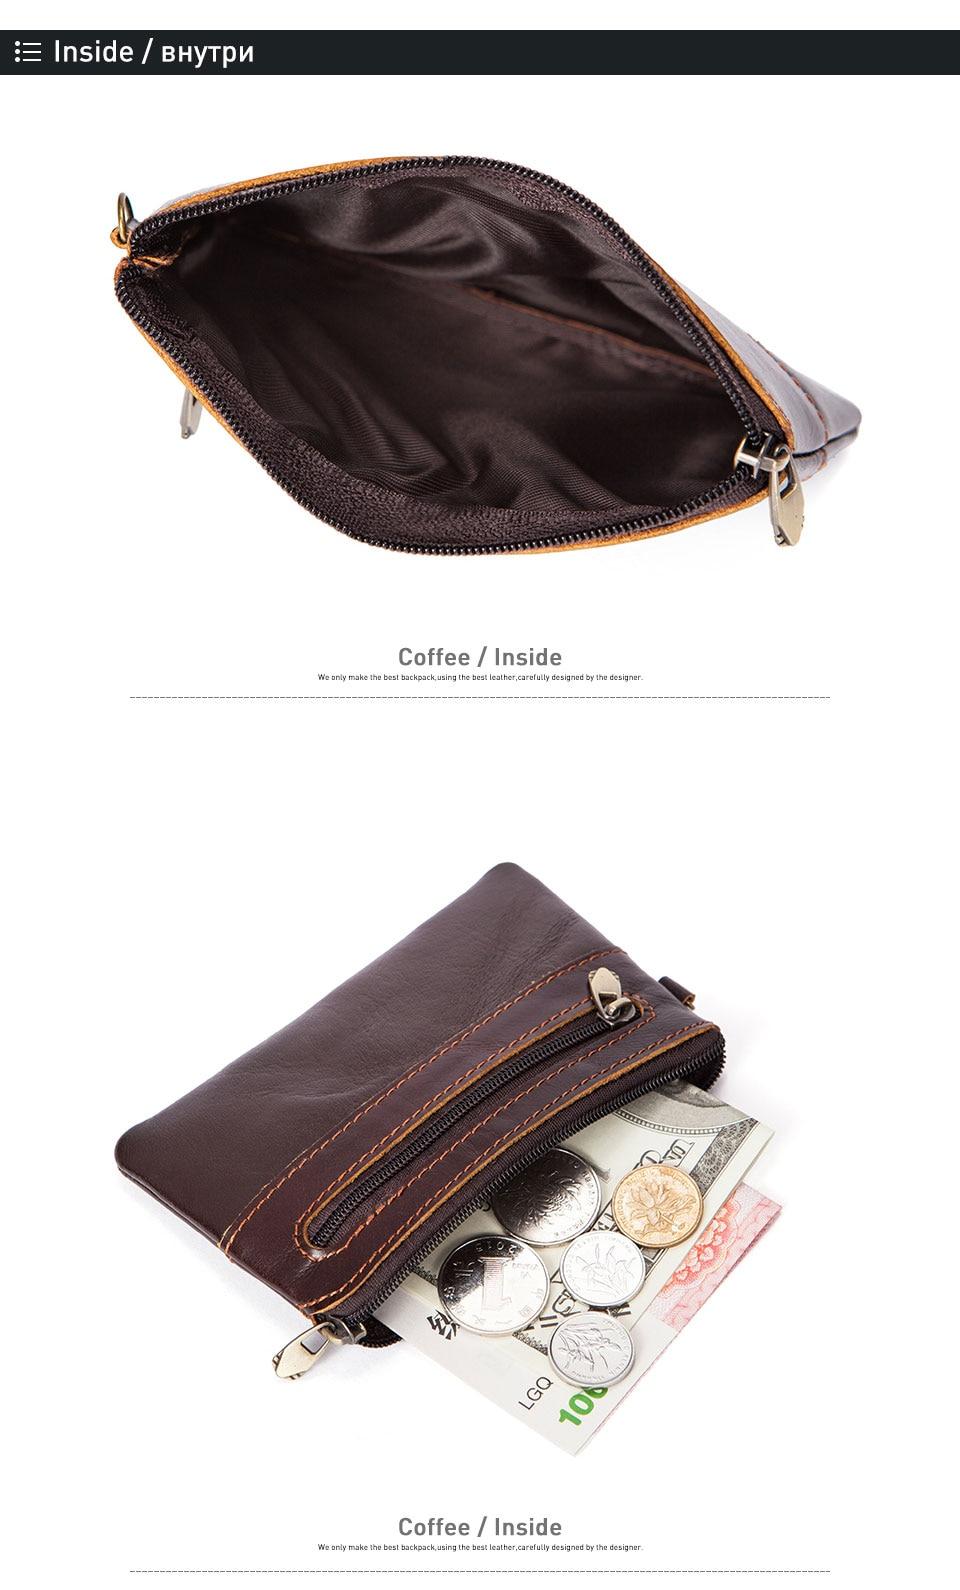 8118_02coin purse